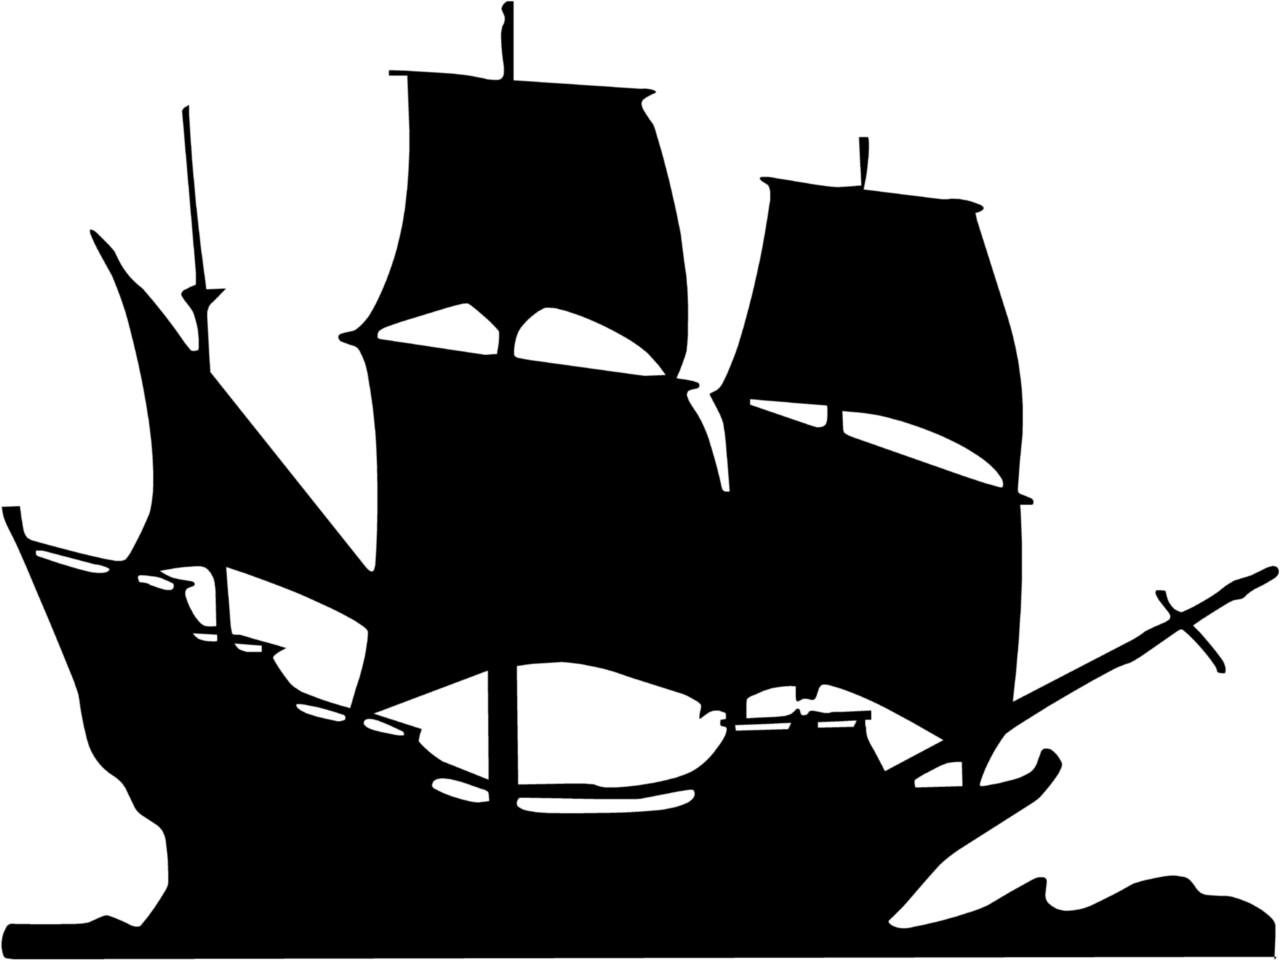 Free Ship Silhouette Clip Art, Download Free Clip Art, Free.